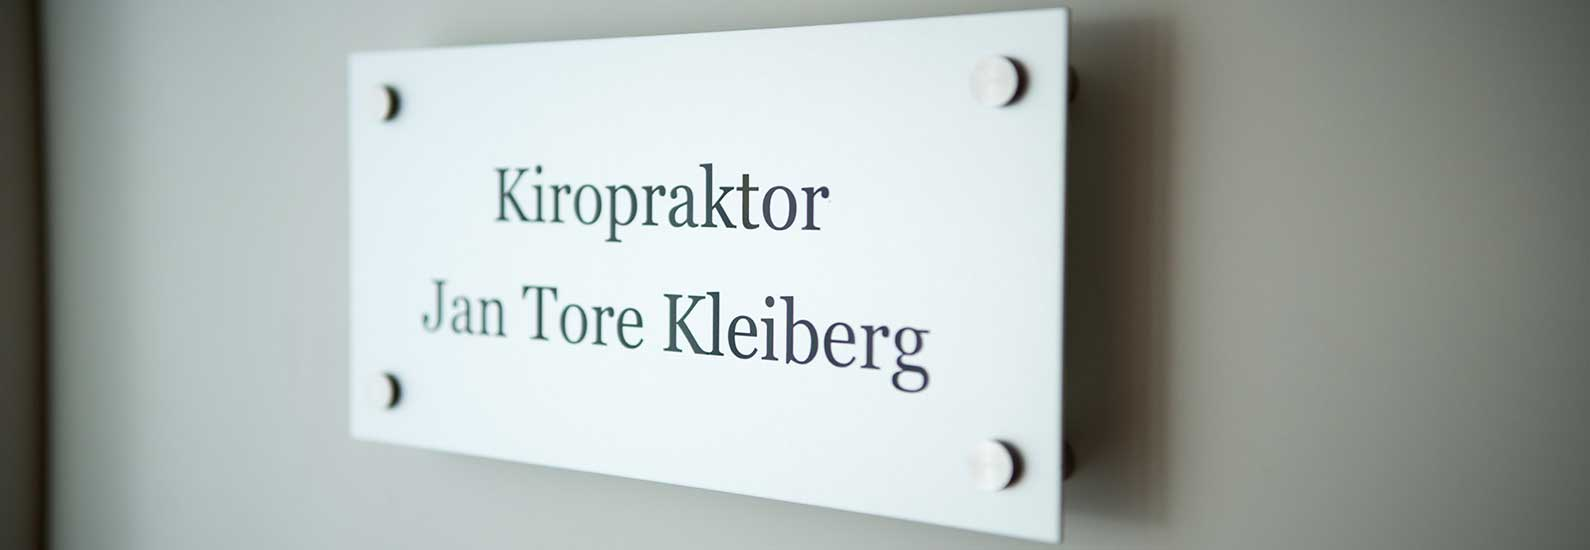 Kiropraktor Stavanger - Vaulen Kiropraktorklinikk